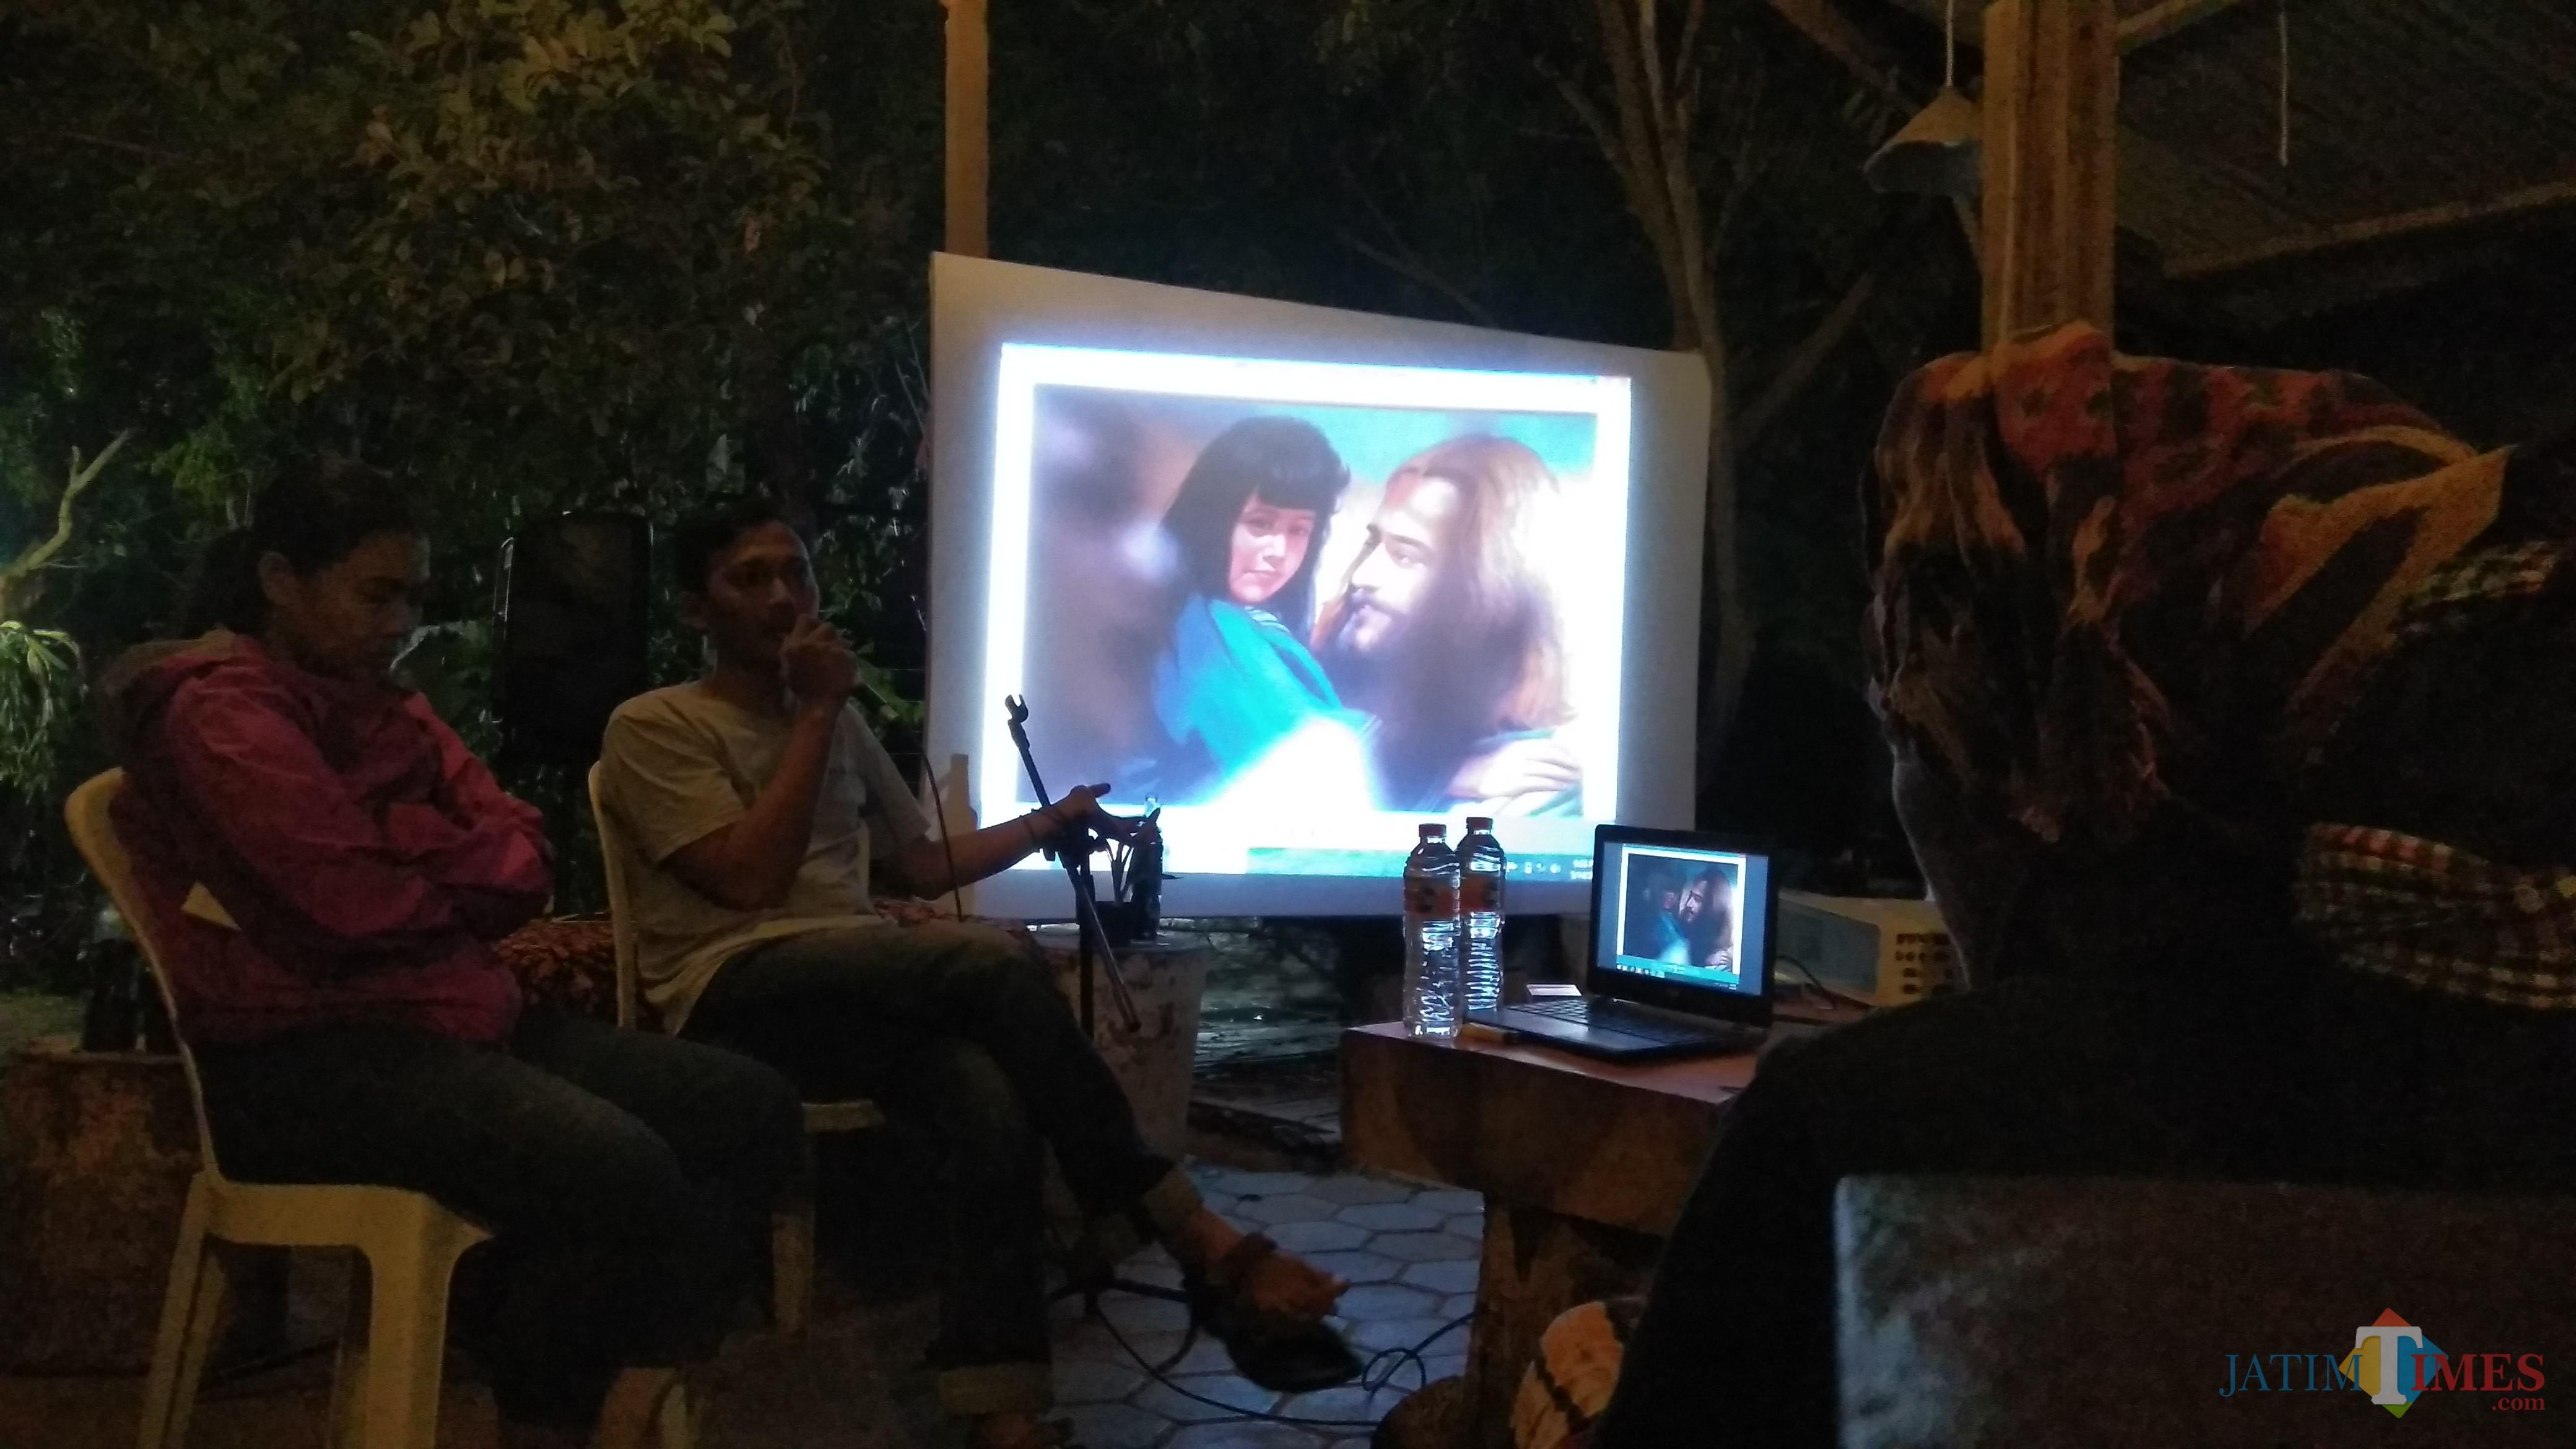 Diskusi foto terkait sorotan media terhadap transgender di Kedai Kopi Kalimetro, Kota Malang. (Foto: Nurlayla Ratri/MalangTIMES)